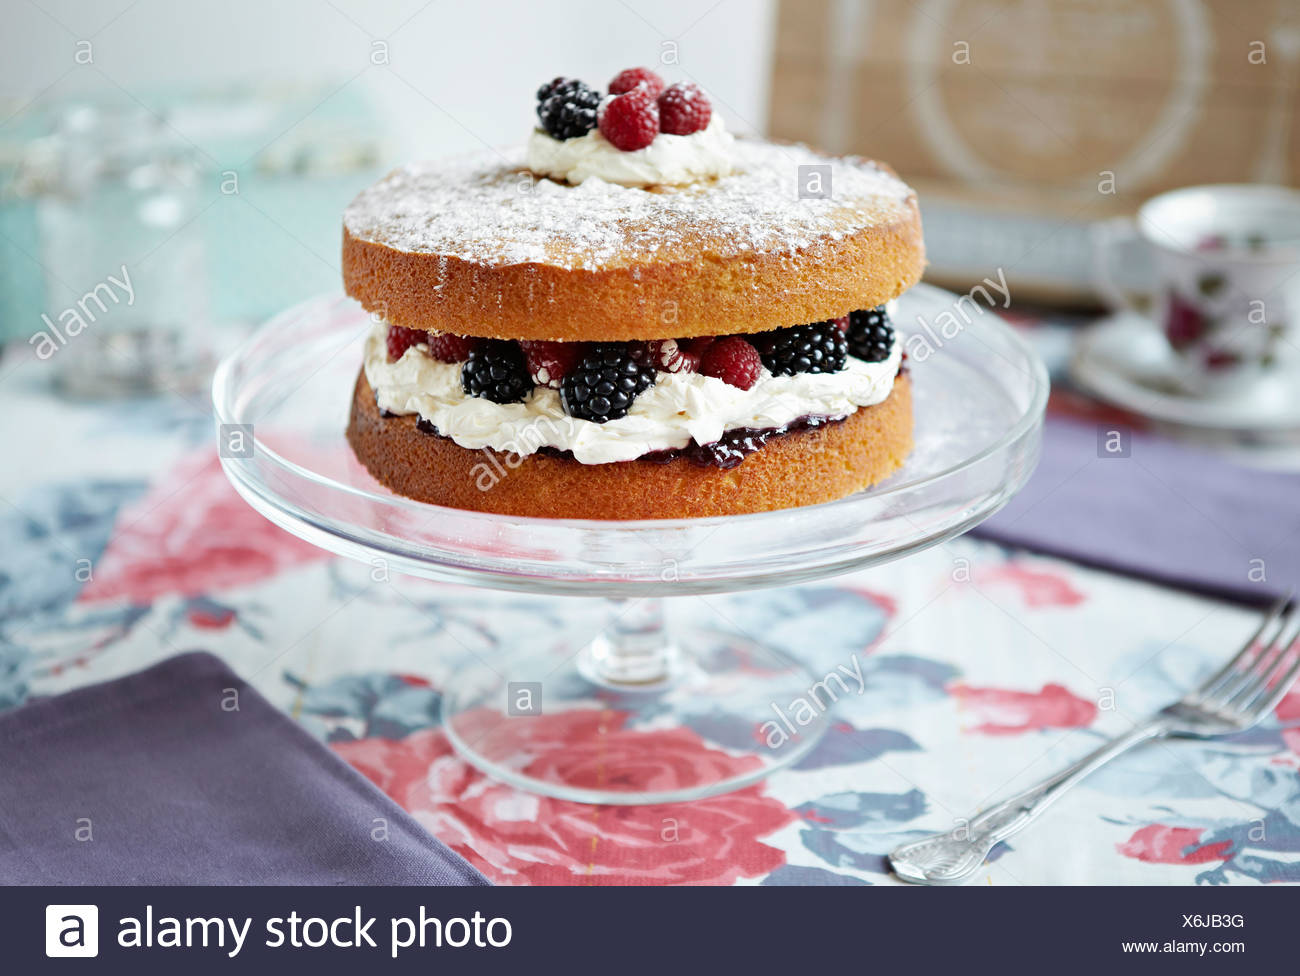 Sponge cake with berries on platter - Stock Image